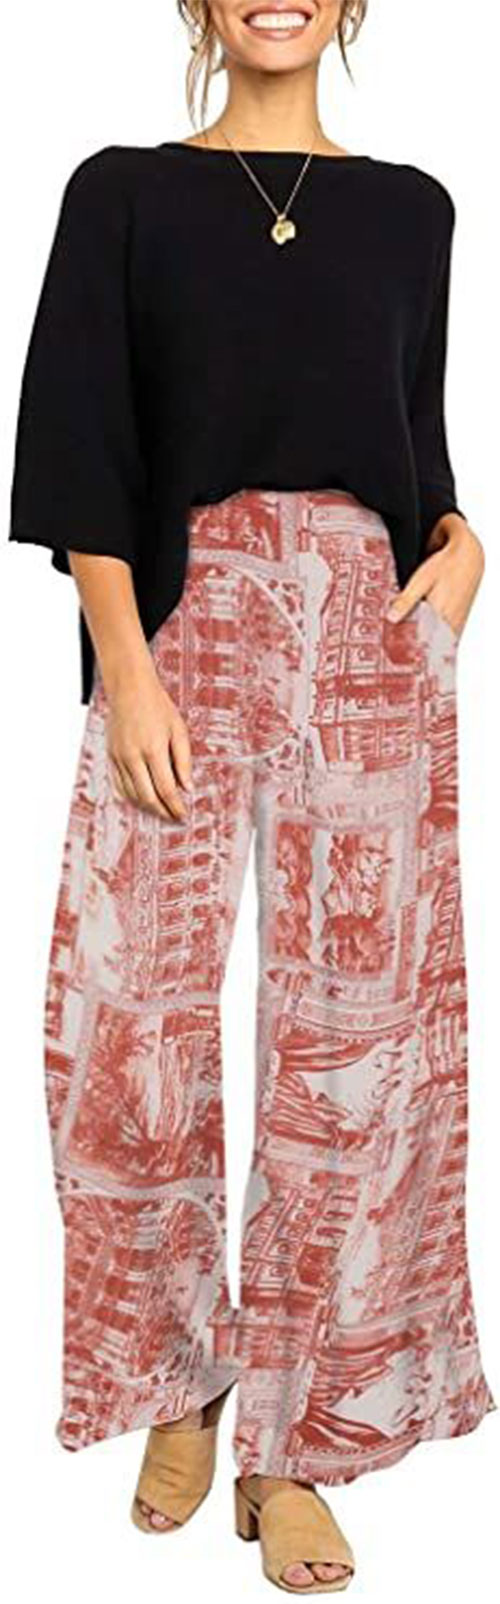 Floral-Print-Pants-For-Girls-Women-2021-Spring-Fashion-12